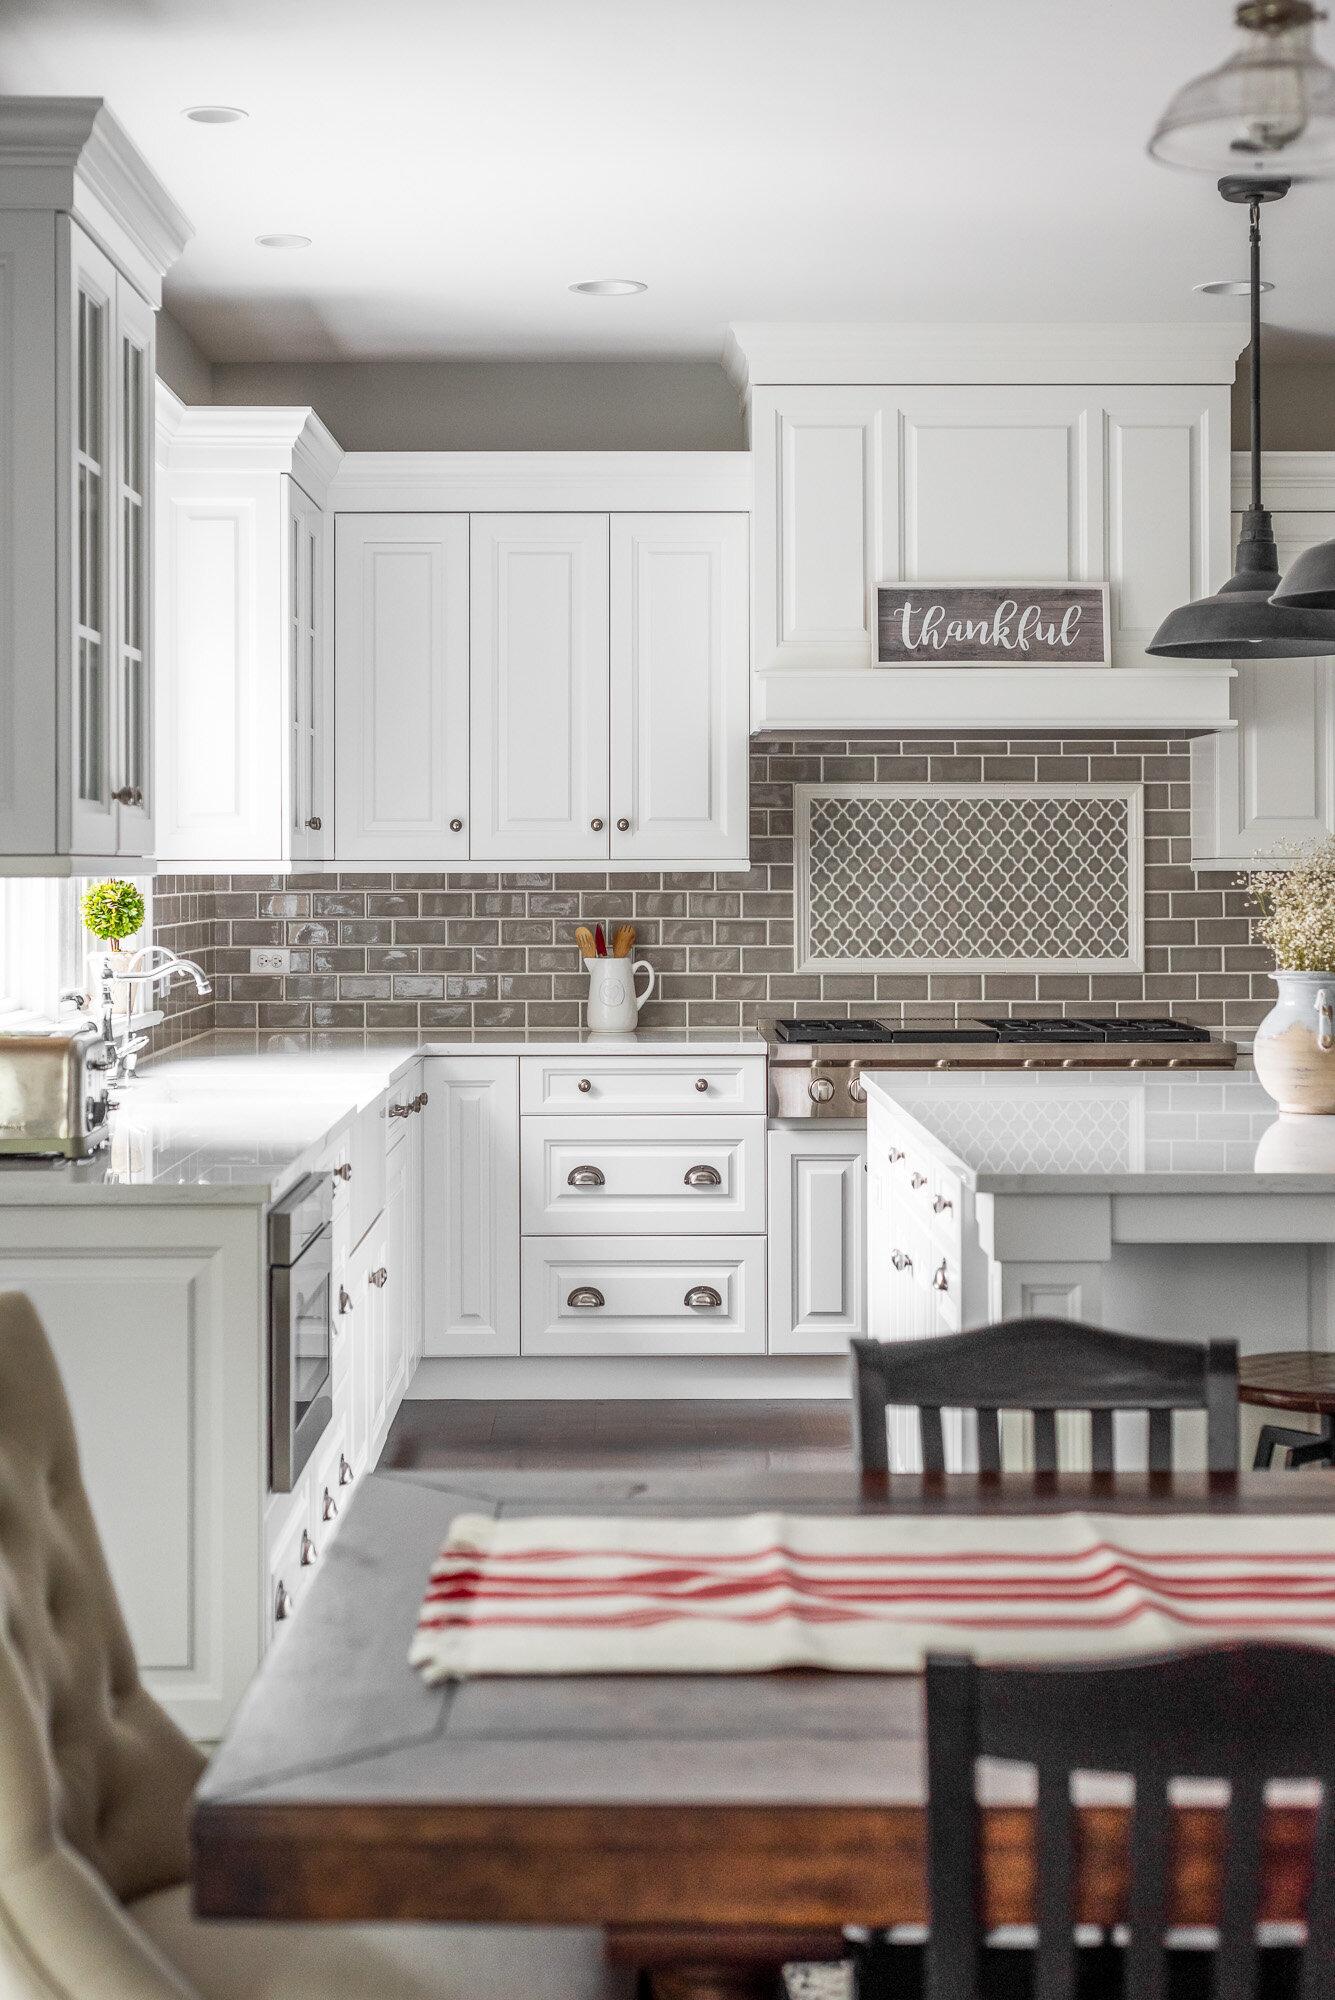 Kitchen-Family Dining.jpg